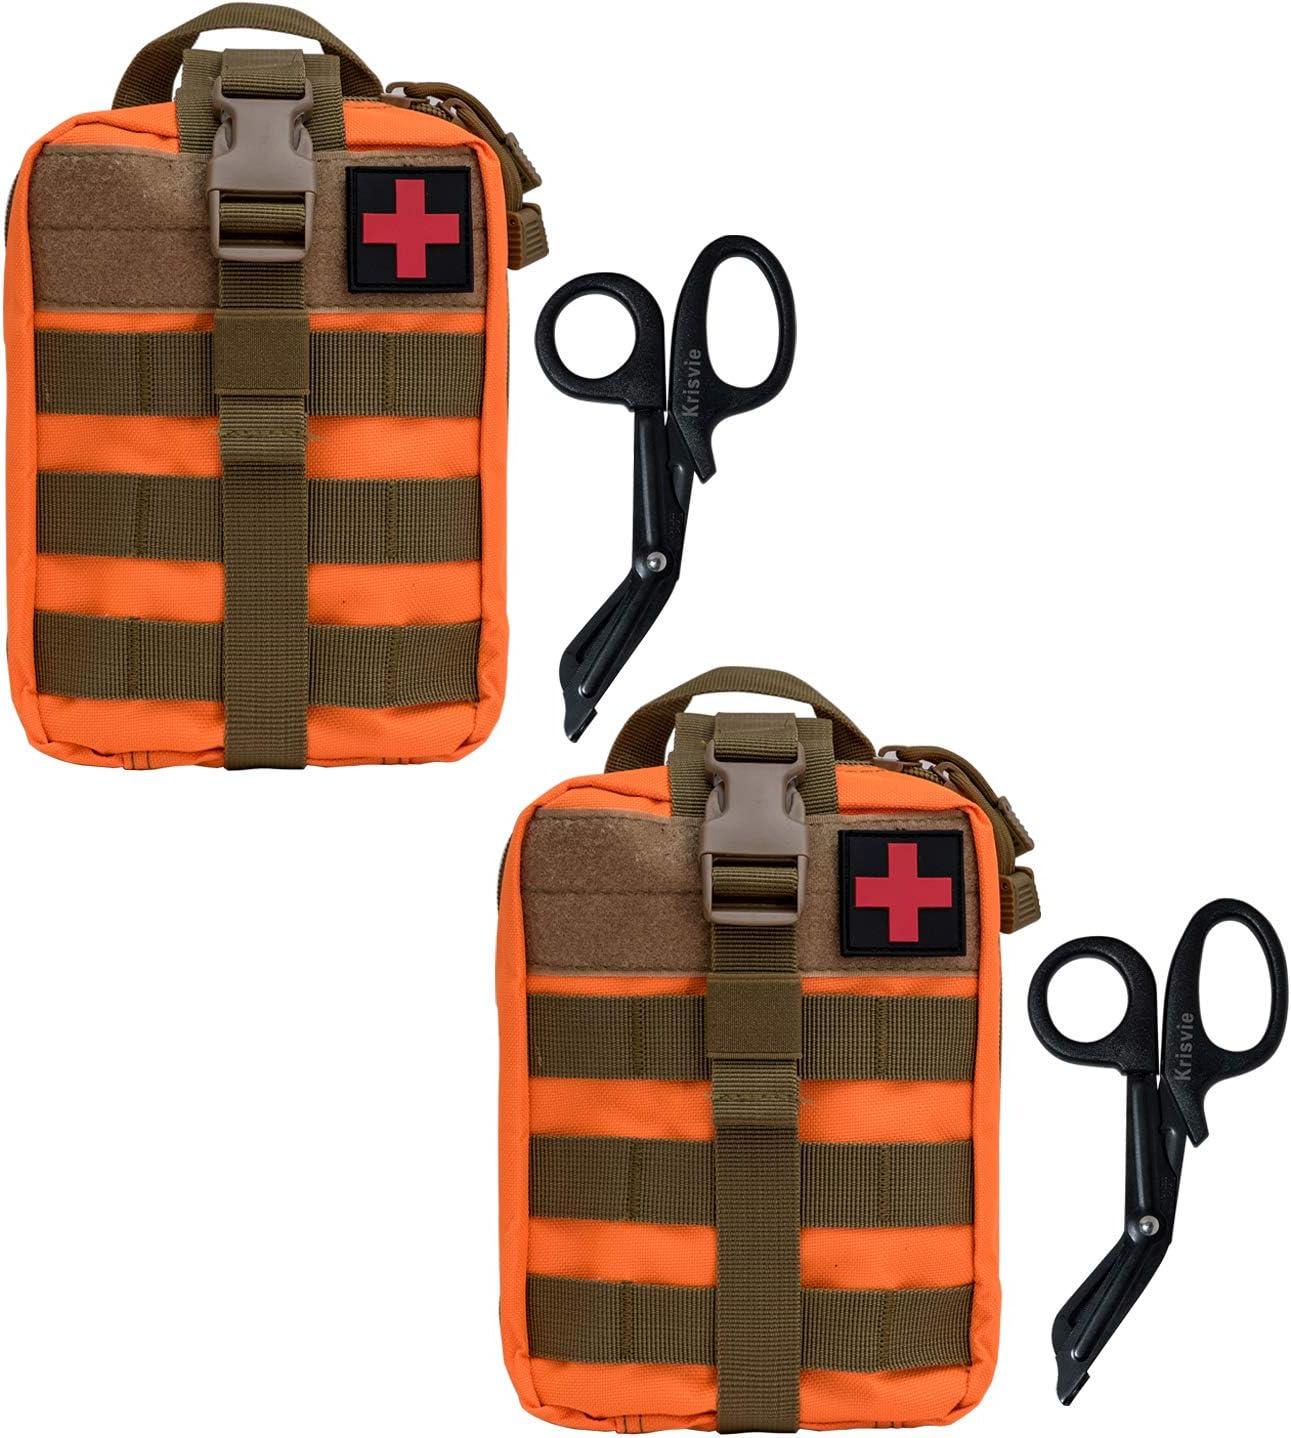 Krisvie 2Pcs M/édica Bolsa Primeros Auxilios Bolsa T/áctica Compacta Botiqu/ín y el Esquileo de los Primeros Auxilios